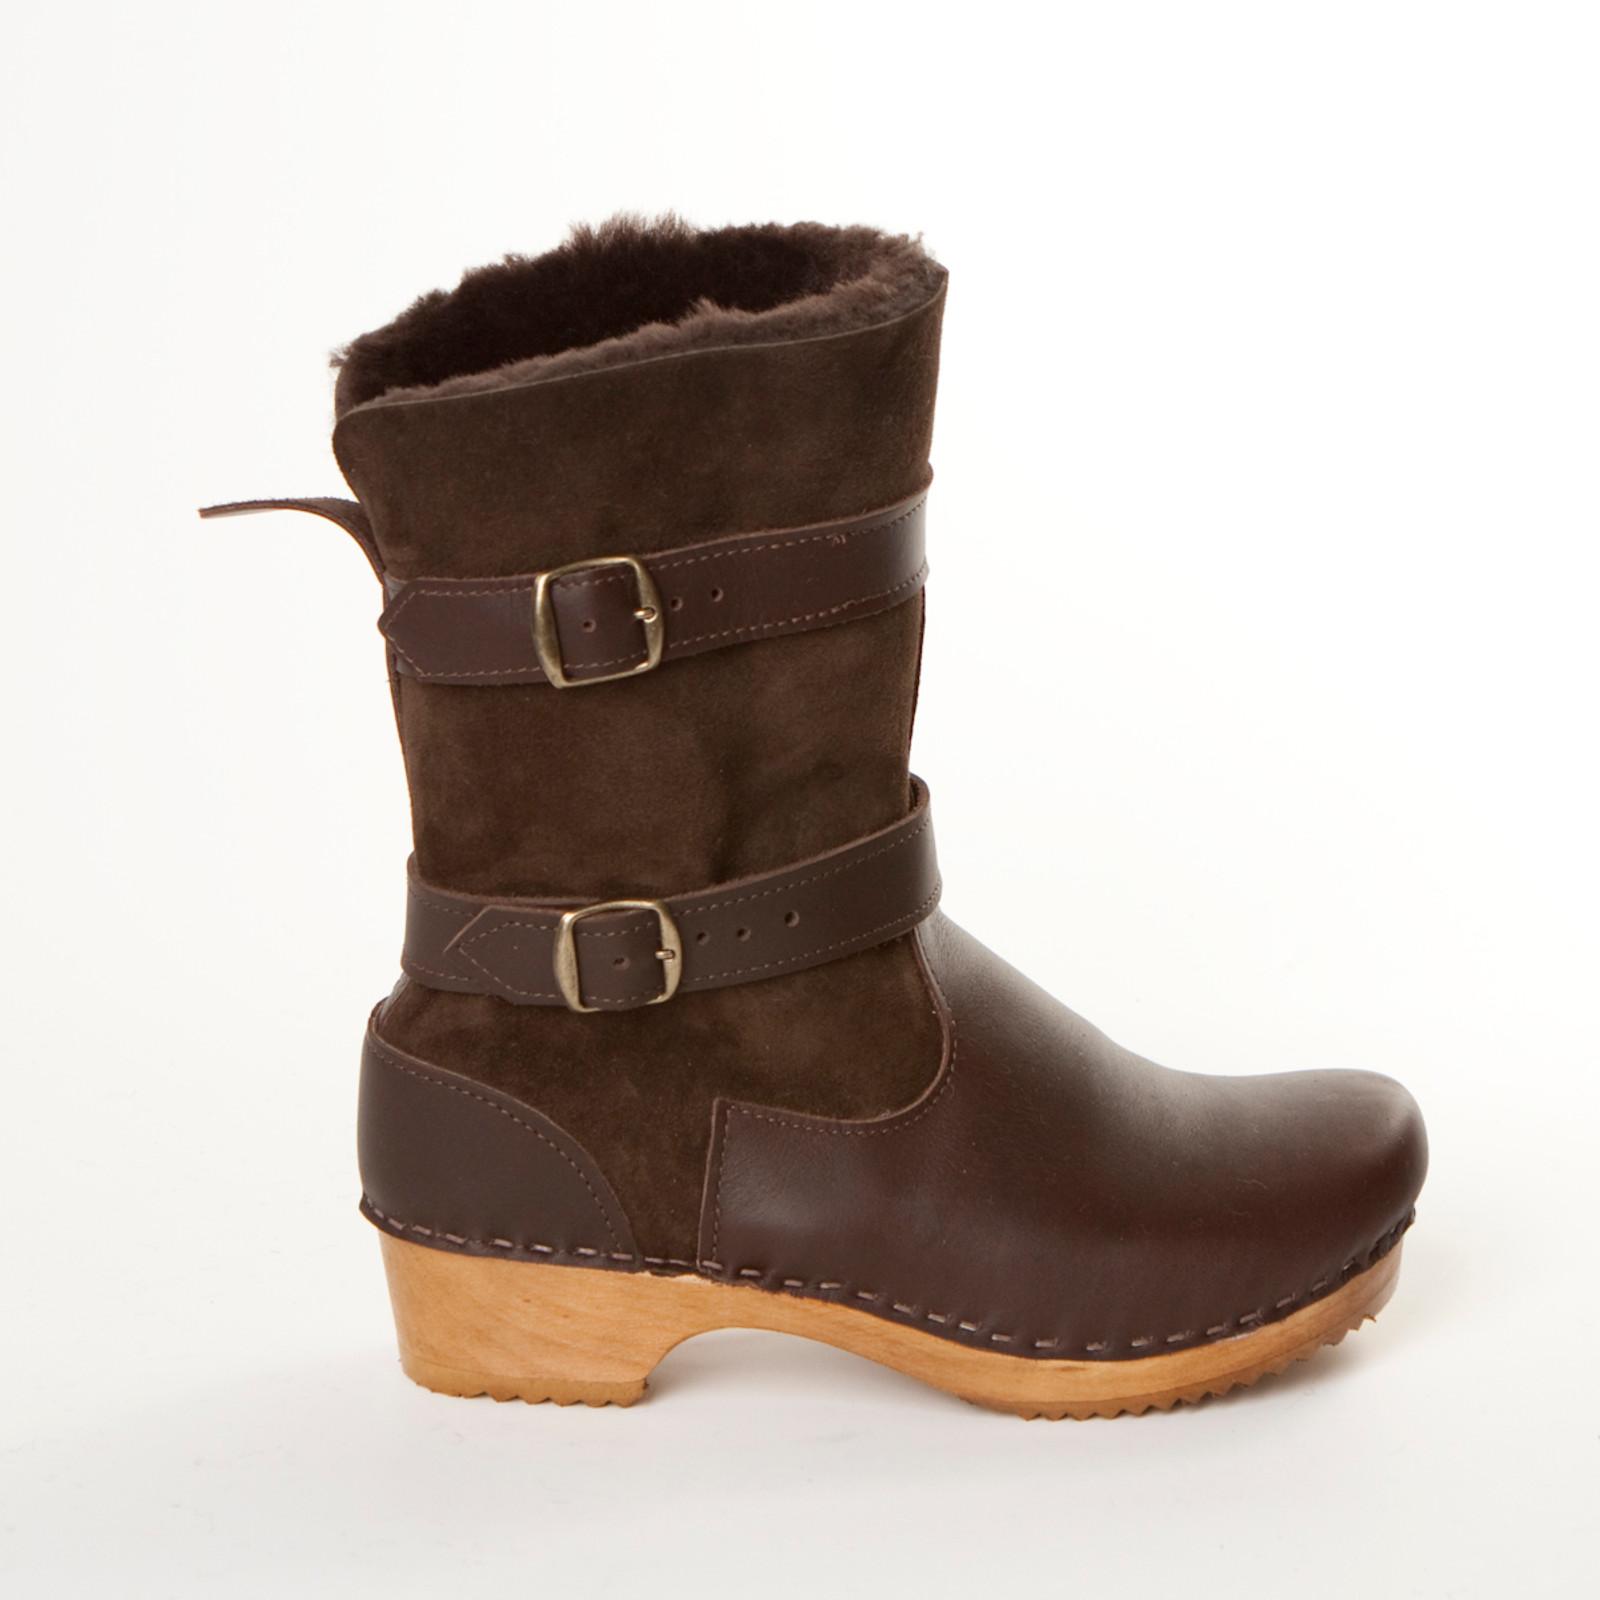 "8"" Clog Boots - Double Straps"